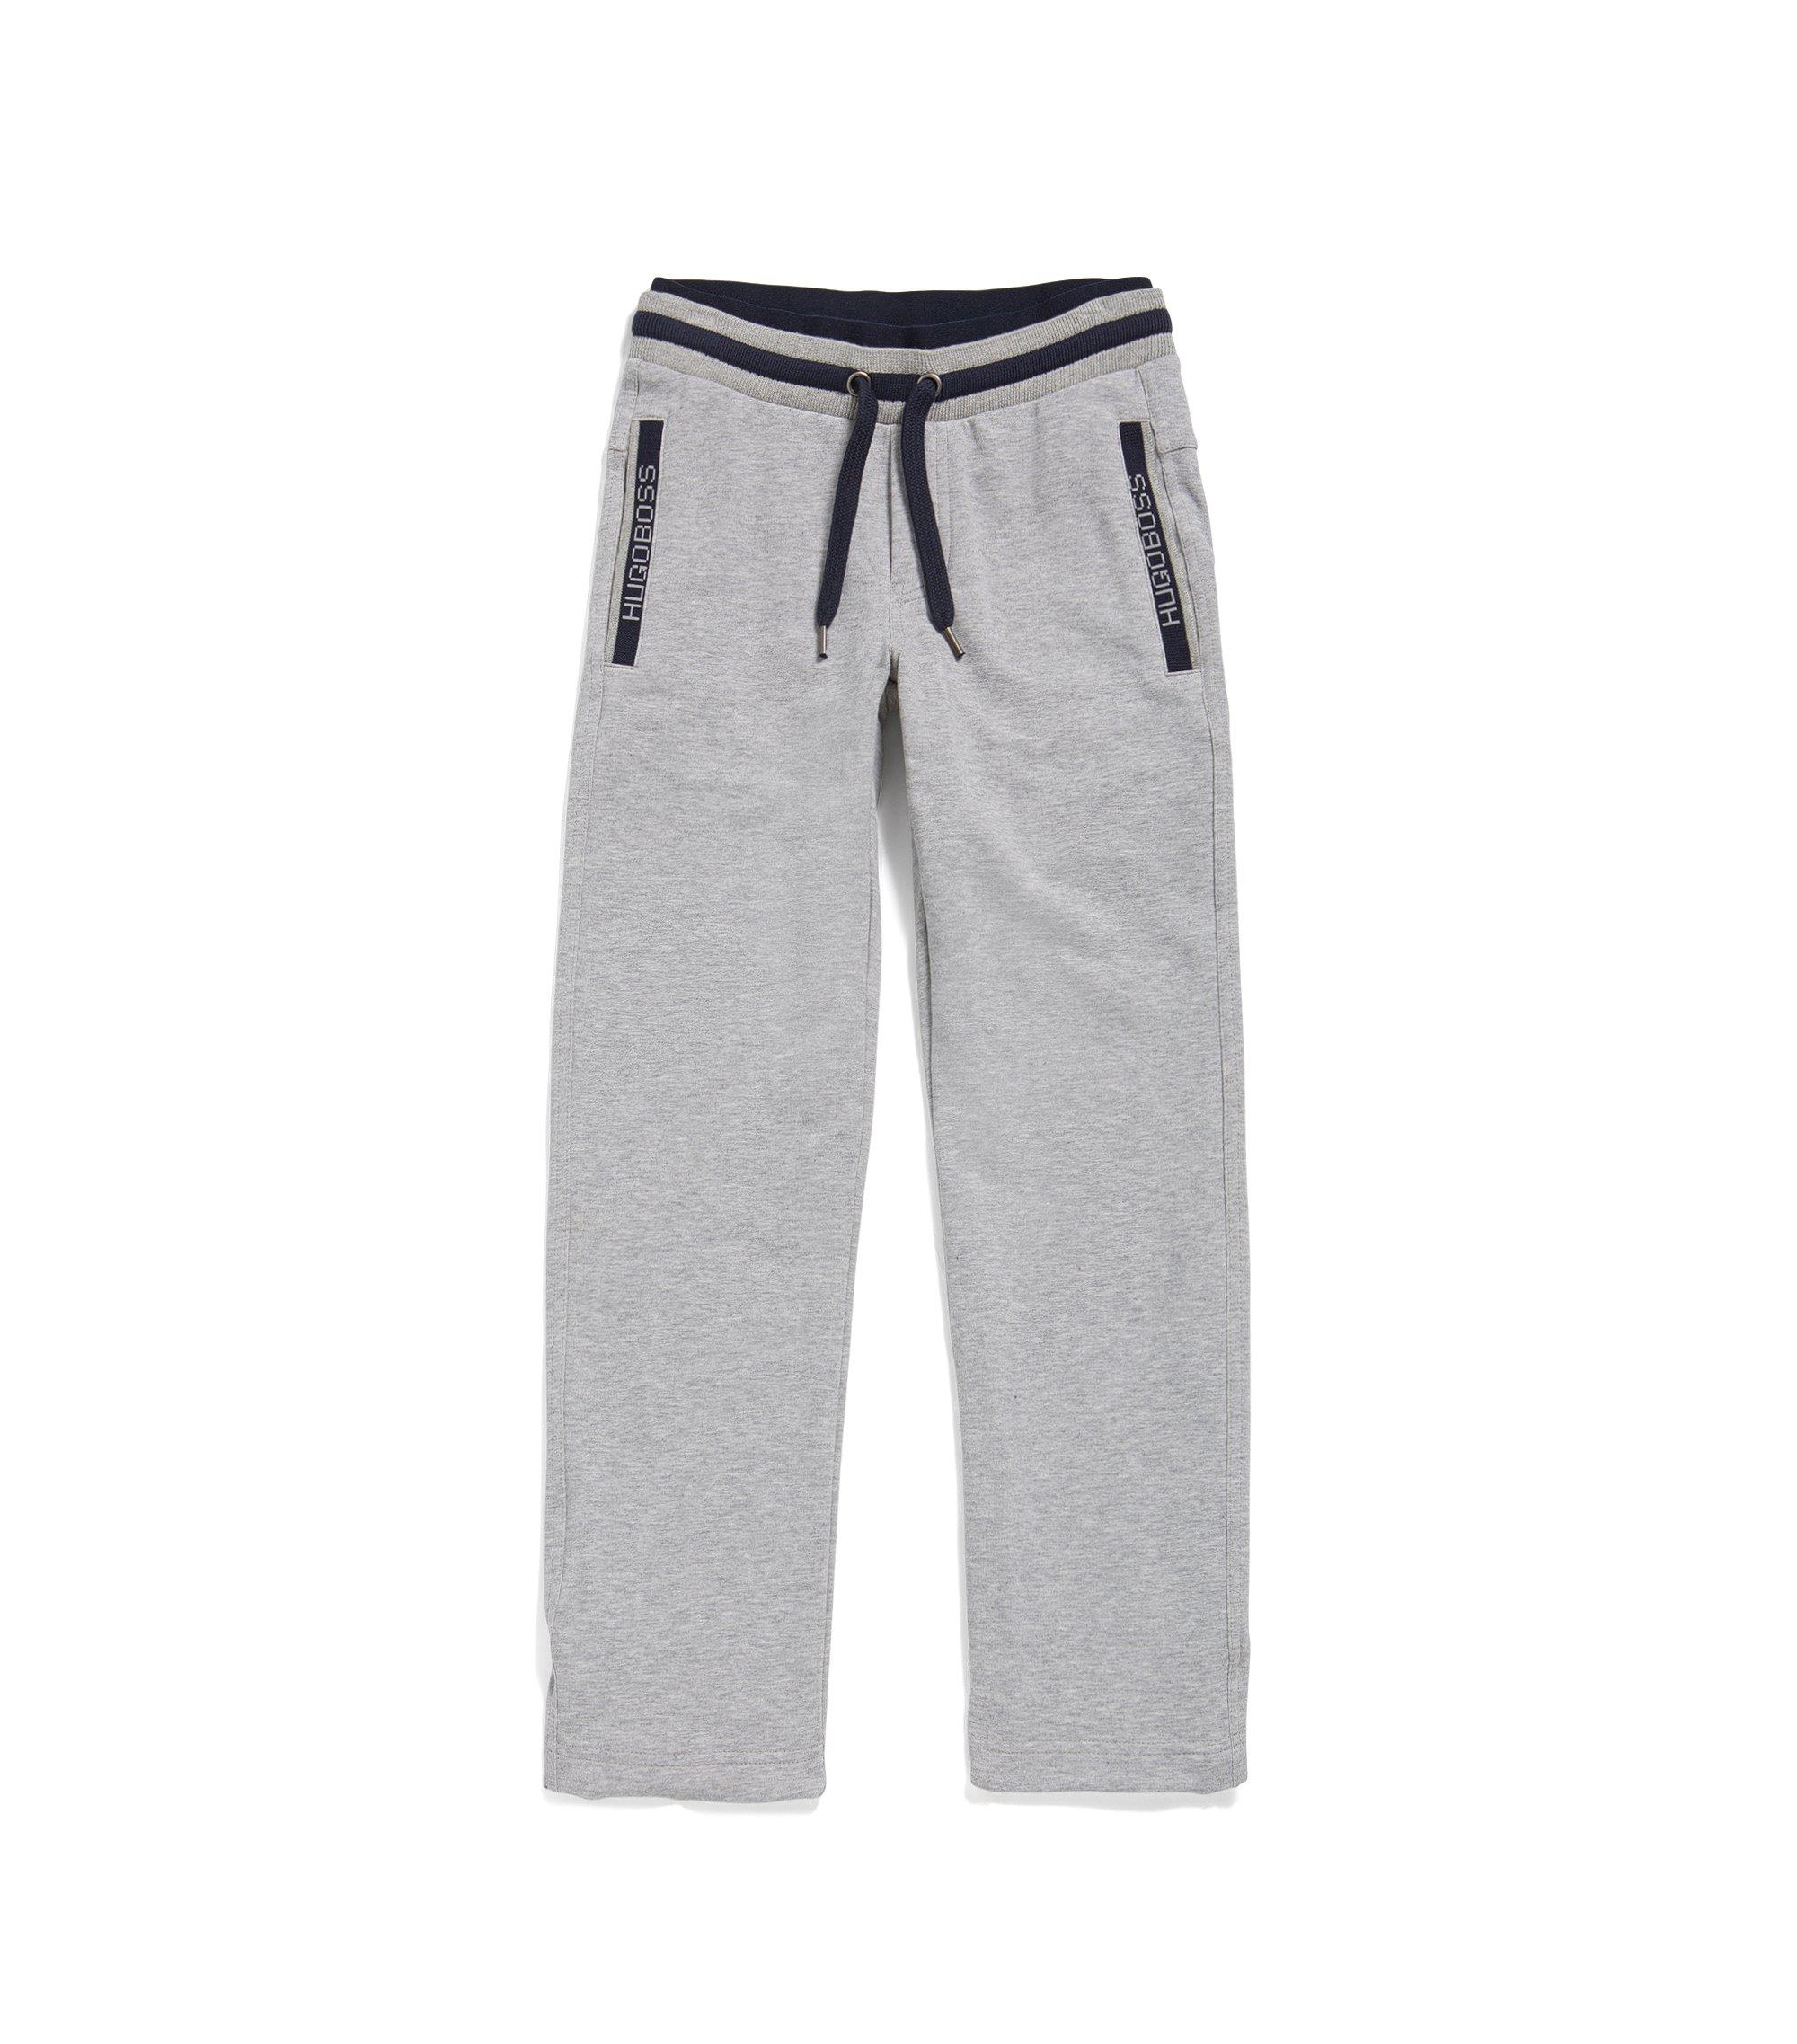 Kids' drawstring jogging bottoms in stretch cotton, Light Grey